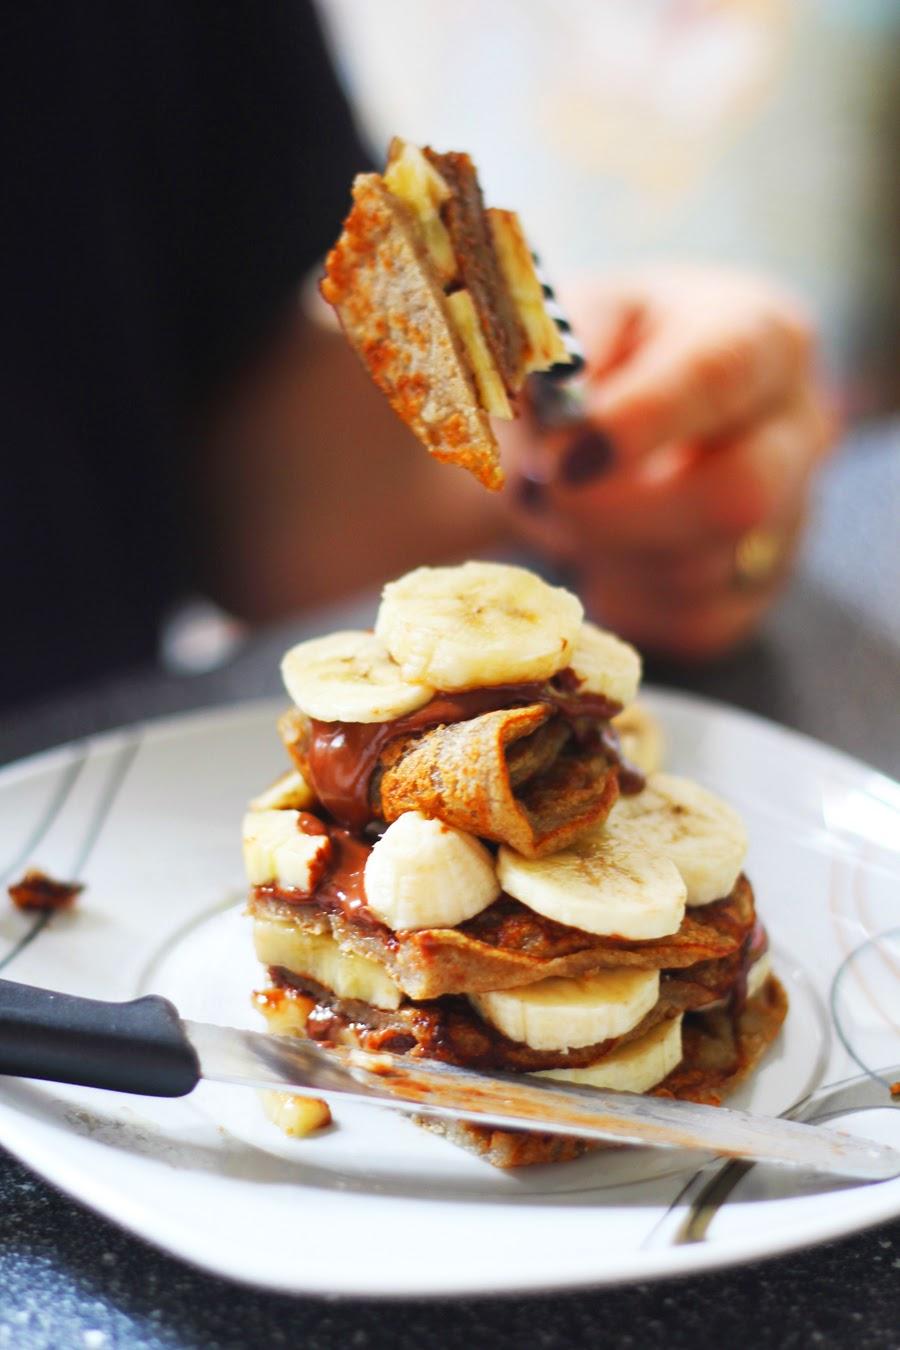 food inspiration vegan cookwithmemonday myberlinfashion pancake